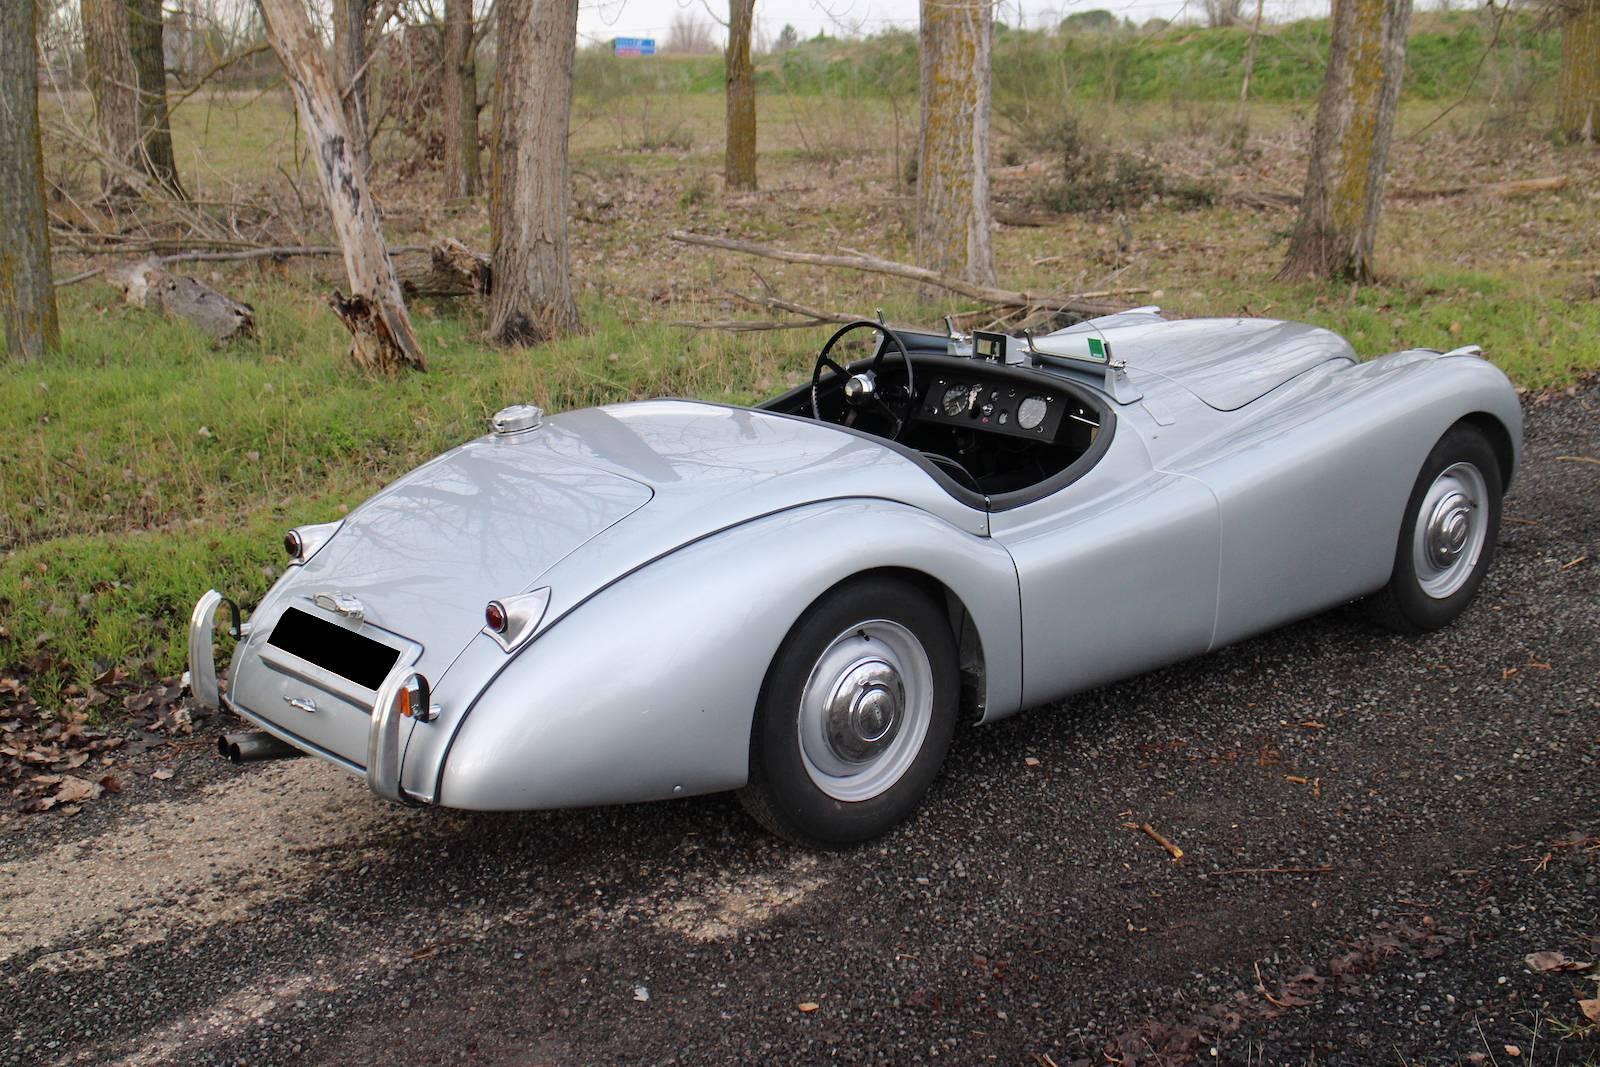 Jaguar XK 120 OTS (Alloy) (1949) for Sale - Classic Trader